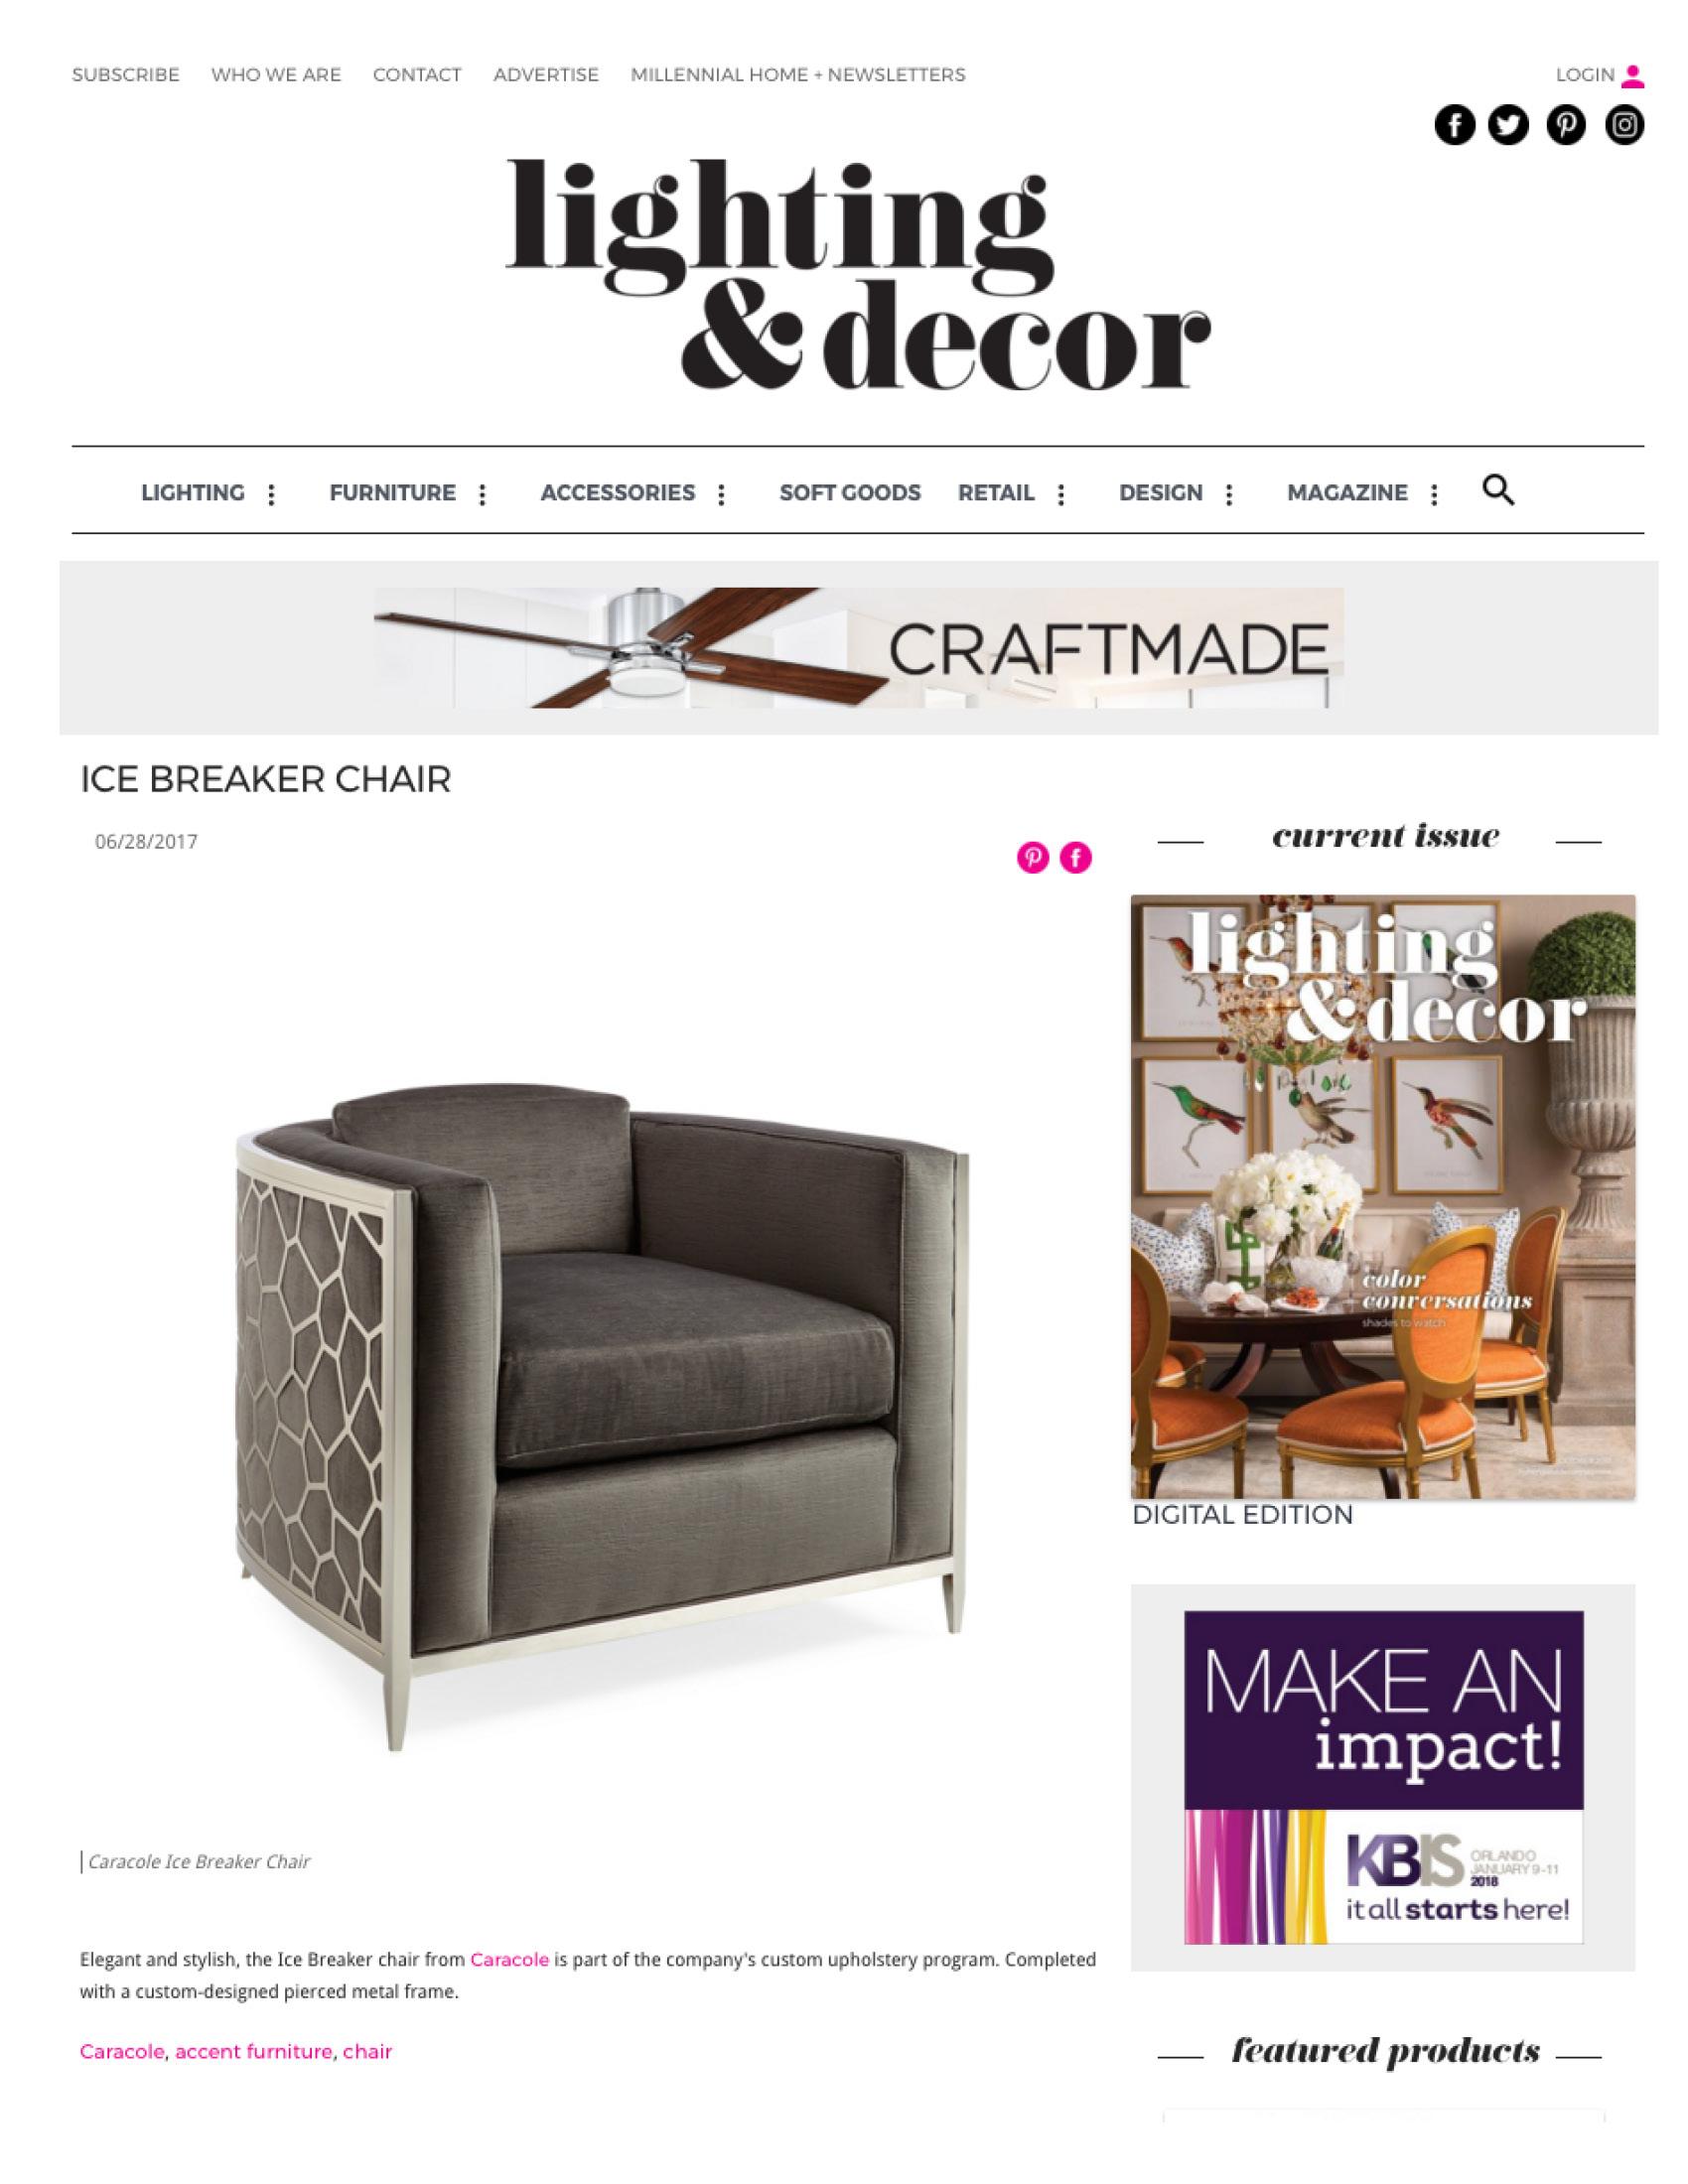 Lighting & Decor Online Product Gallery, June 2017